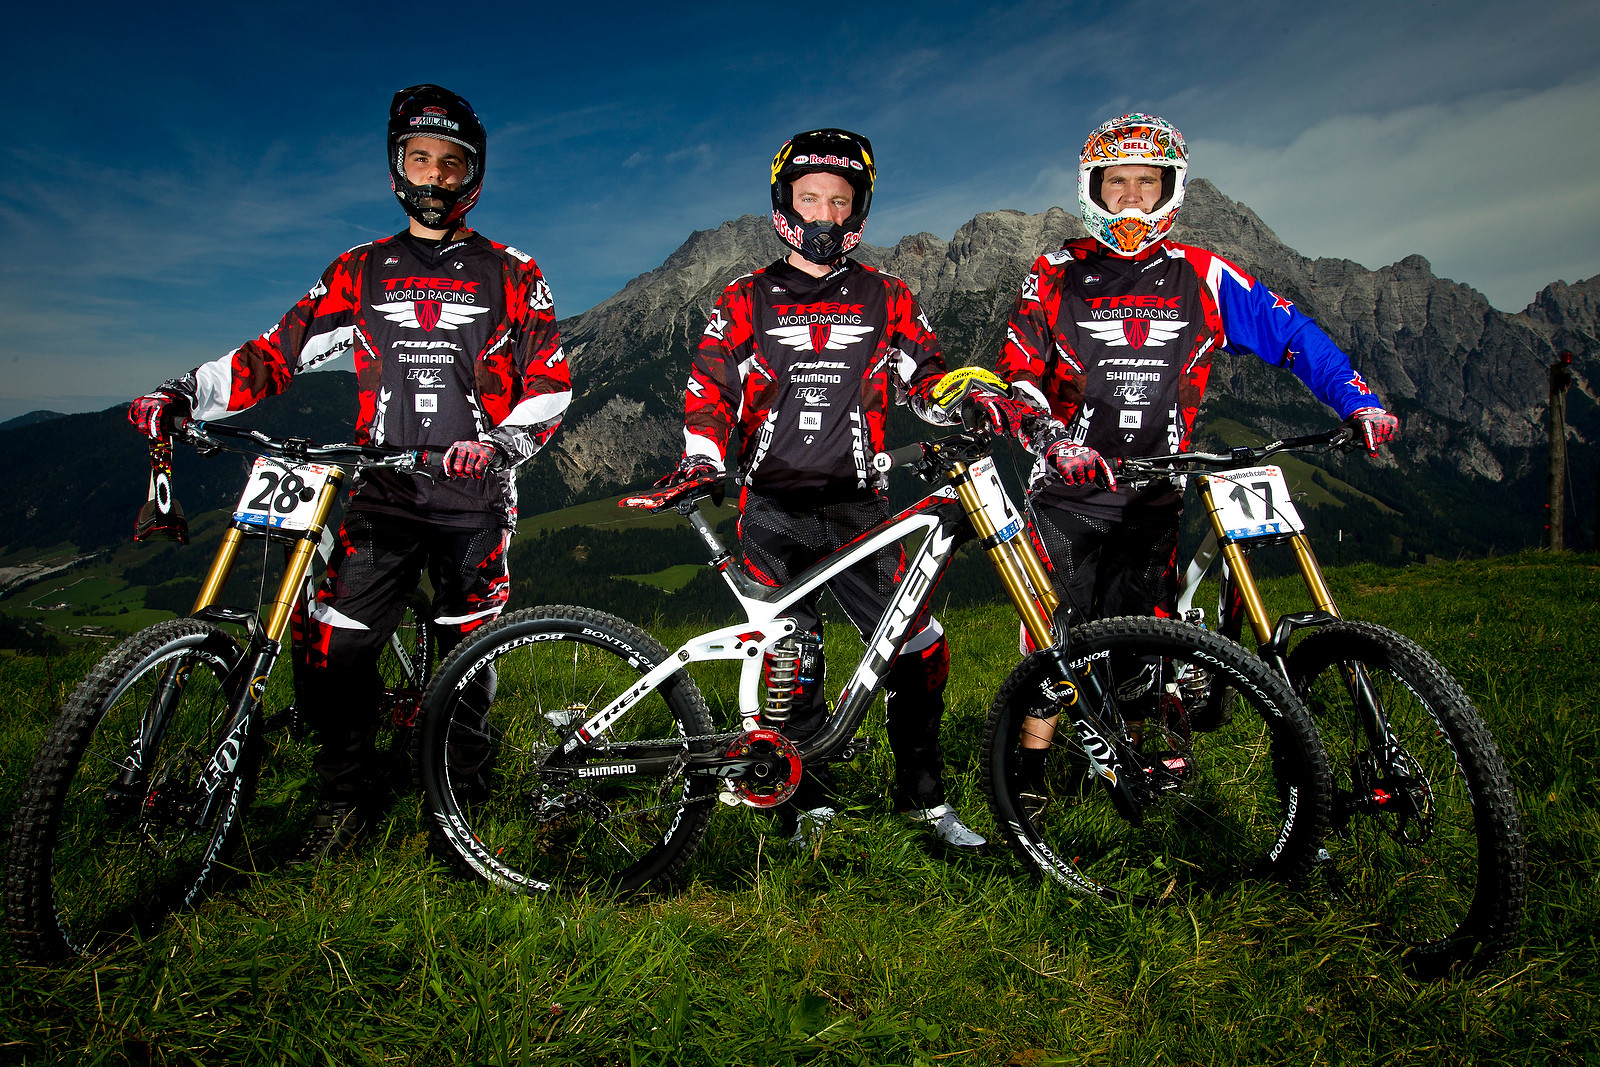 Trek World Racing at World Champs - World Championships Riders and Bikes - Mountain Biking Pictures - Vital MTB